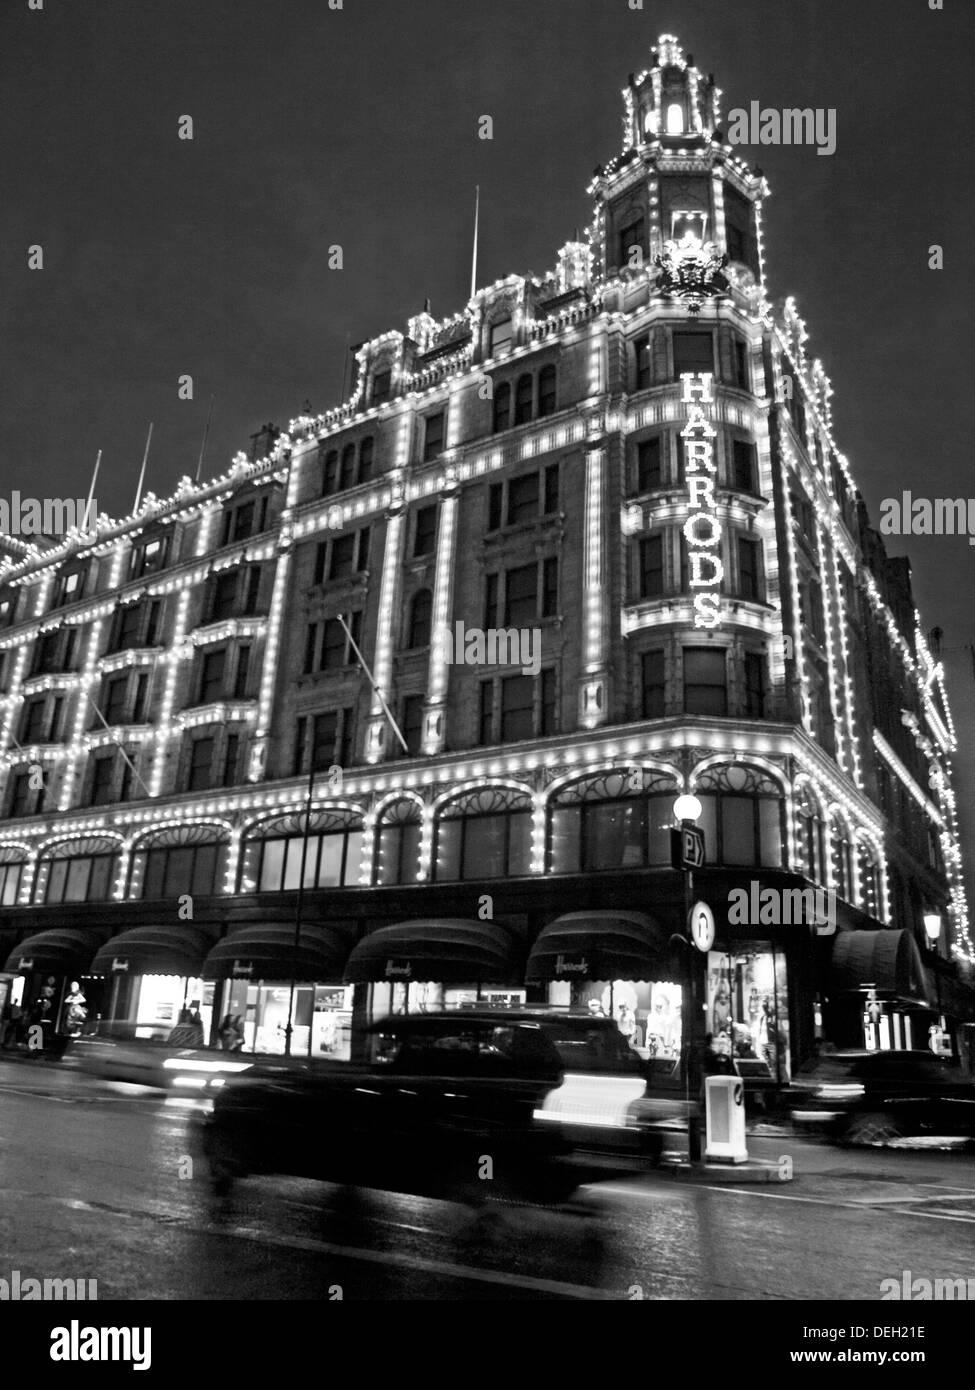 Harrods Department Store at night, Brompton Road,  Knightsbridge, Royal Borough of Kensington and Chelsea Stock Photo